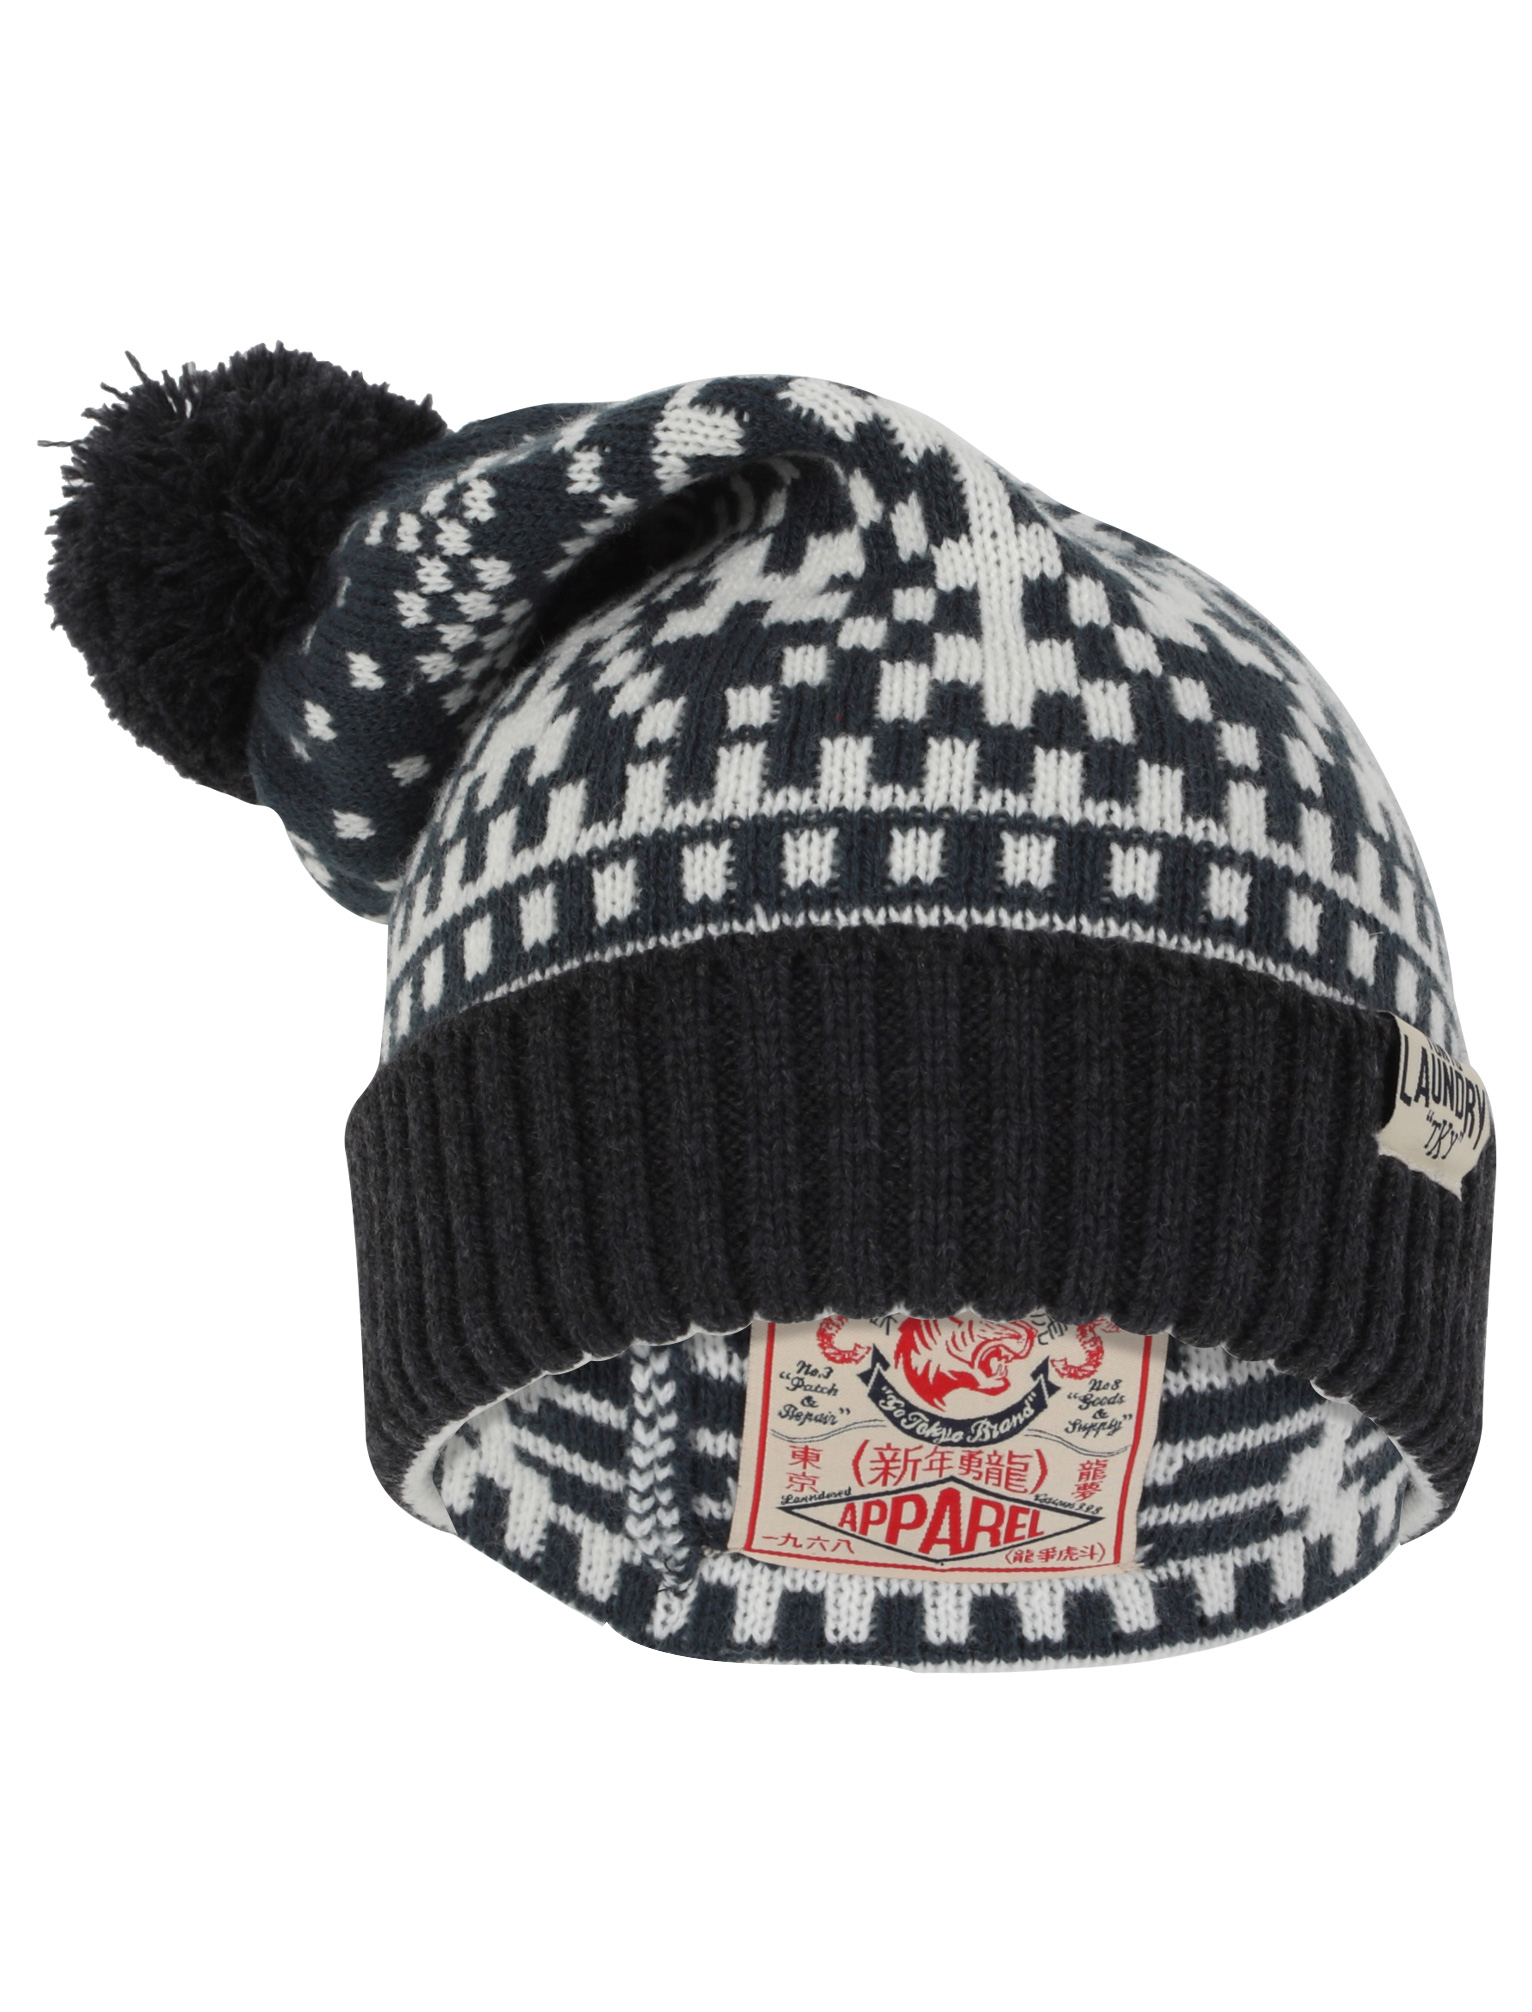 Mens Bobble Hat Knitting Pattern : NEW TOKYO LAUNDRY MENS PENDA GREY JAQUARD PATTERN KNITTED ...